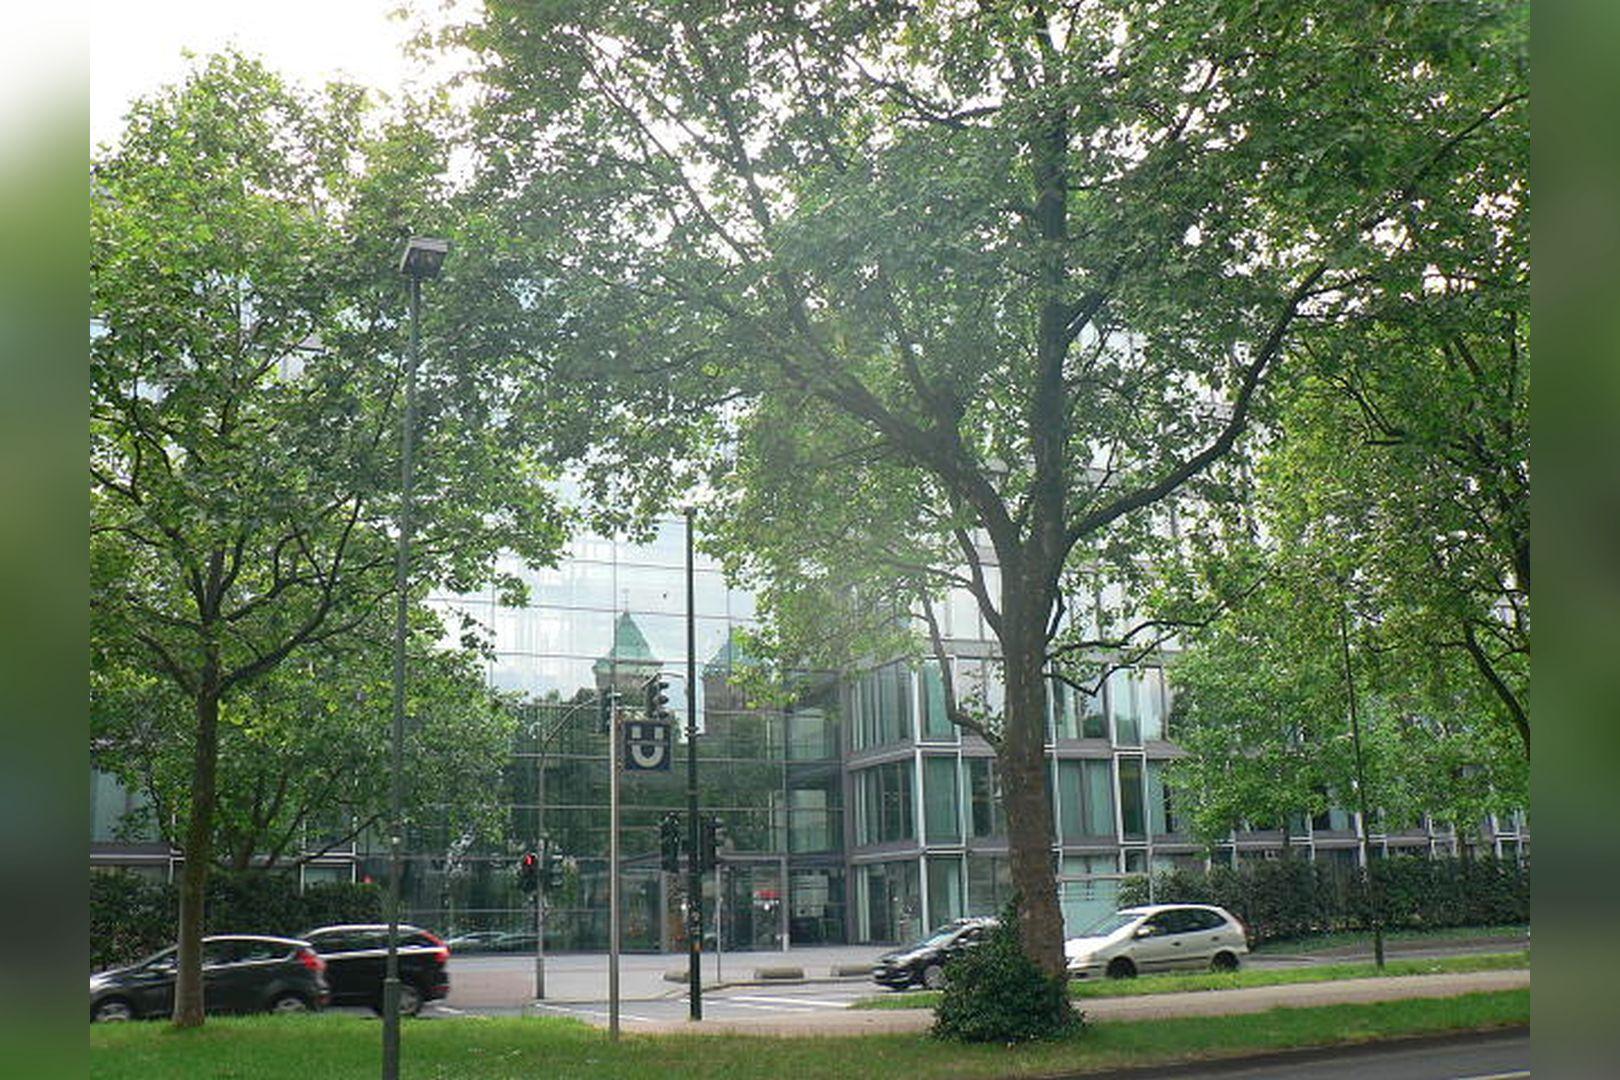 Immobilie Nr.114 - Bürofläche im Altbauobjekt - Bild 17.jpg